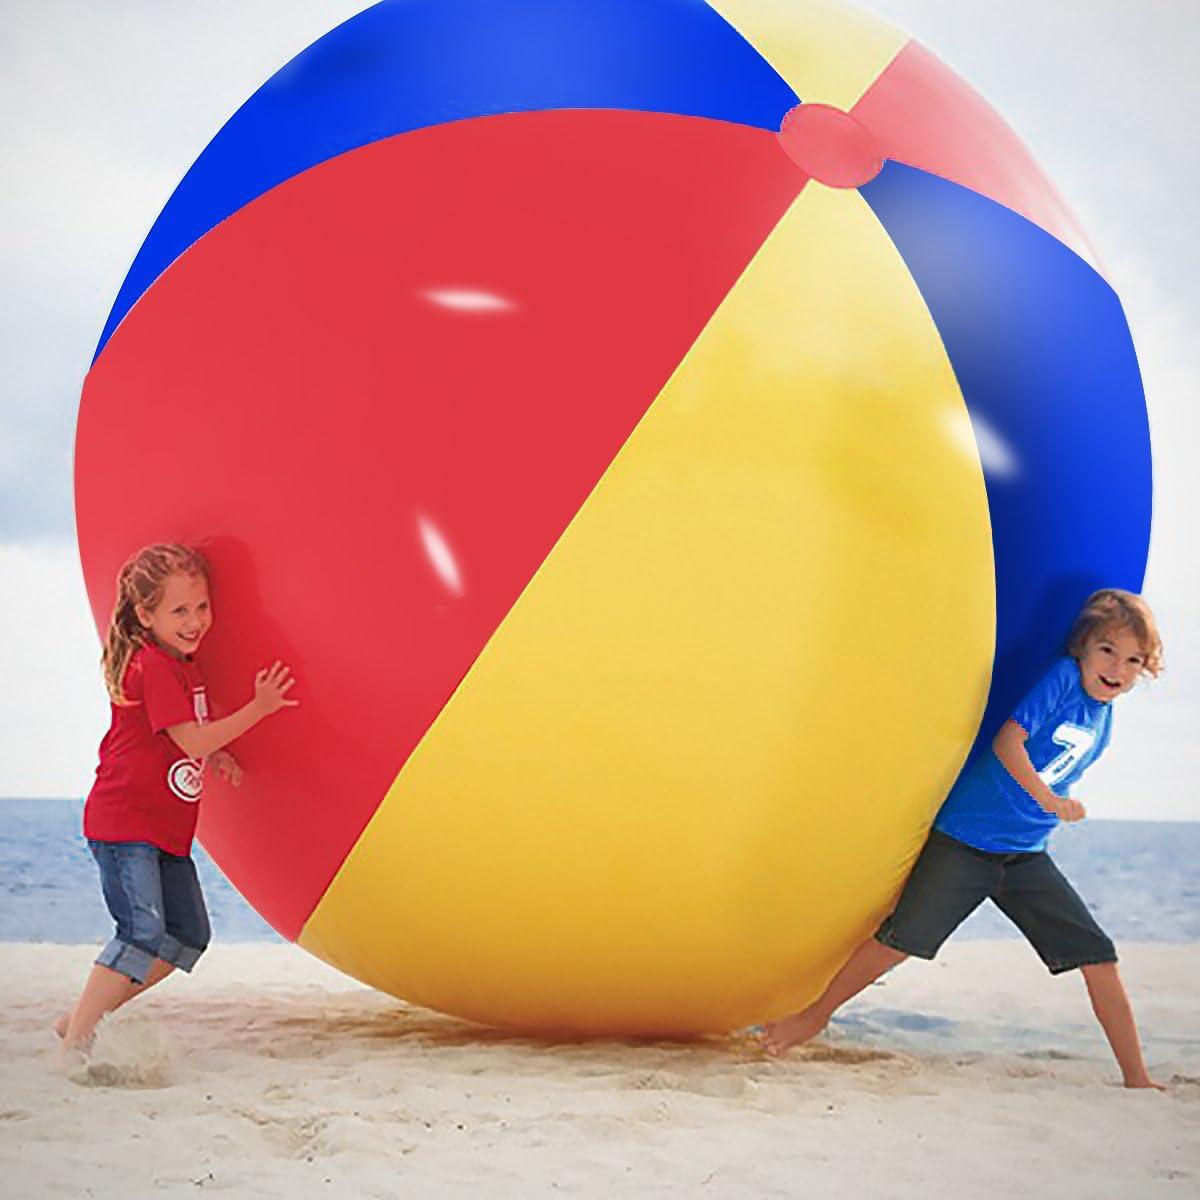 Novelty Place Gigante Pelota de Playa Inflable, Juego de Piscina para Niños y Adultos - Tamaño Jumbo 1,5 Metros (1,5 Metros)